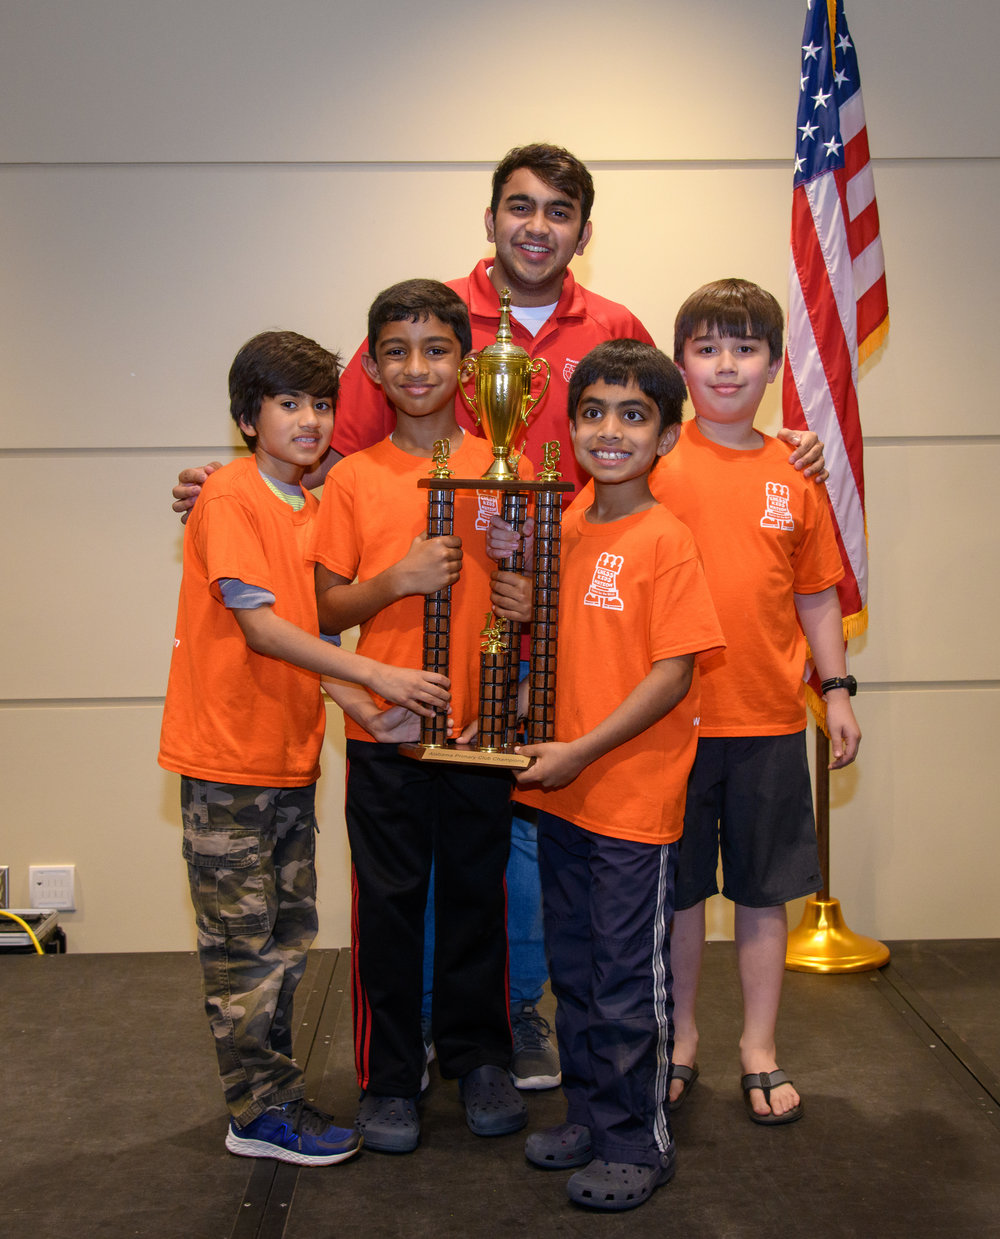 ChessKidsNation: K-3 Club Champions